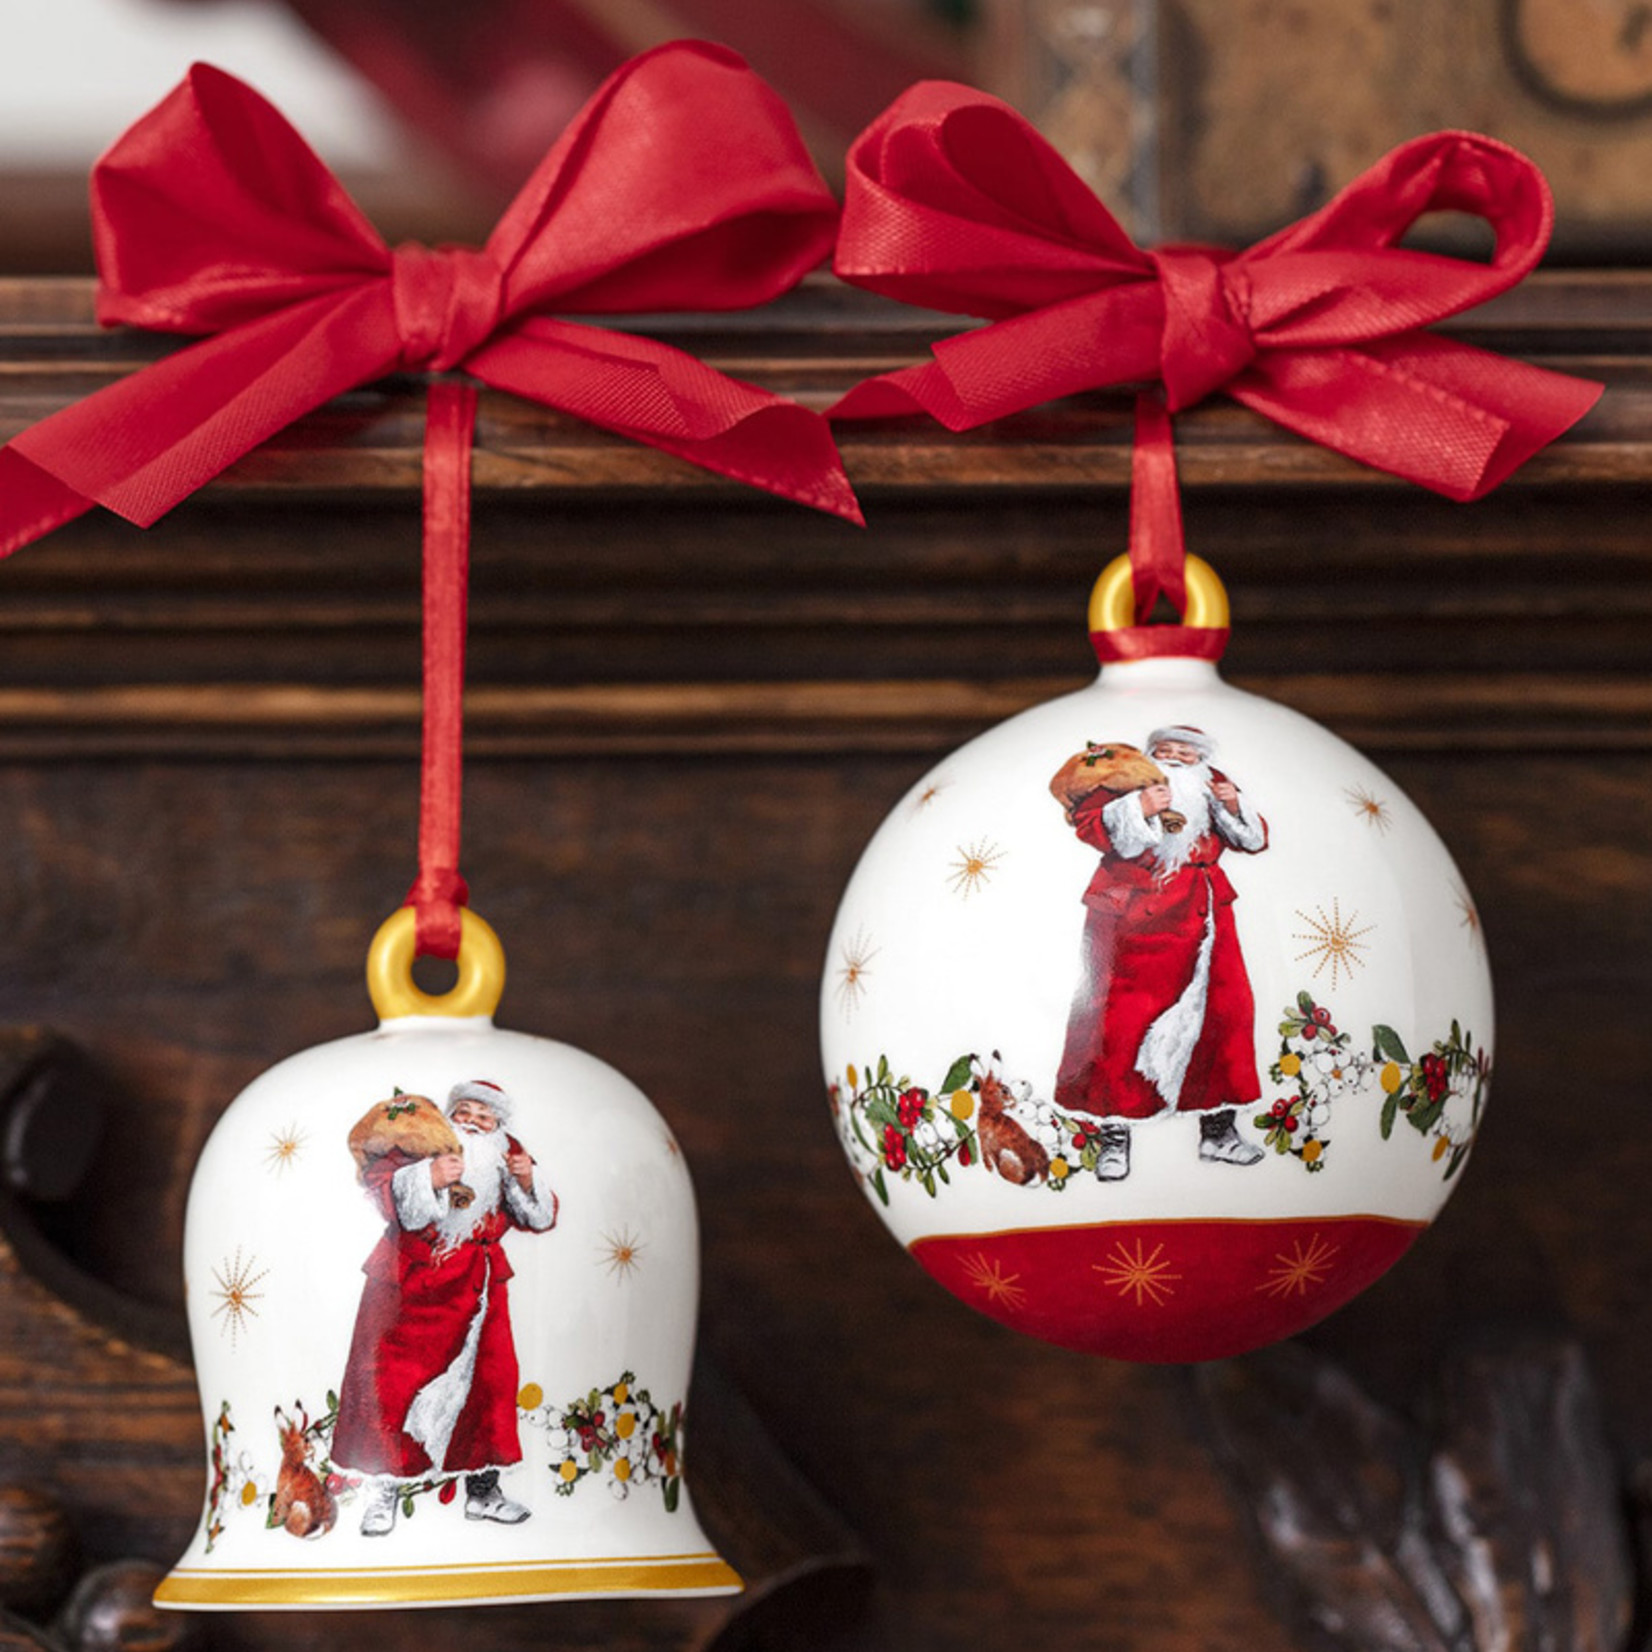 Villeroy & Boch  Jahresglocke 2020 | Villeroy & Boch Annual Christmas Glocke